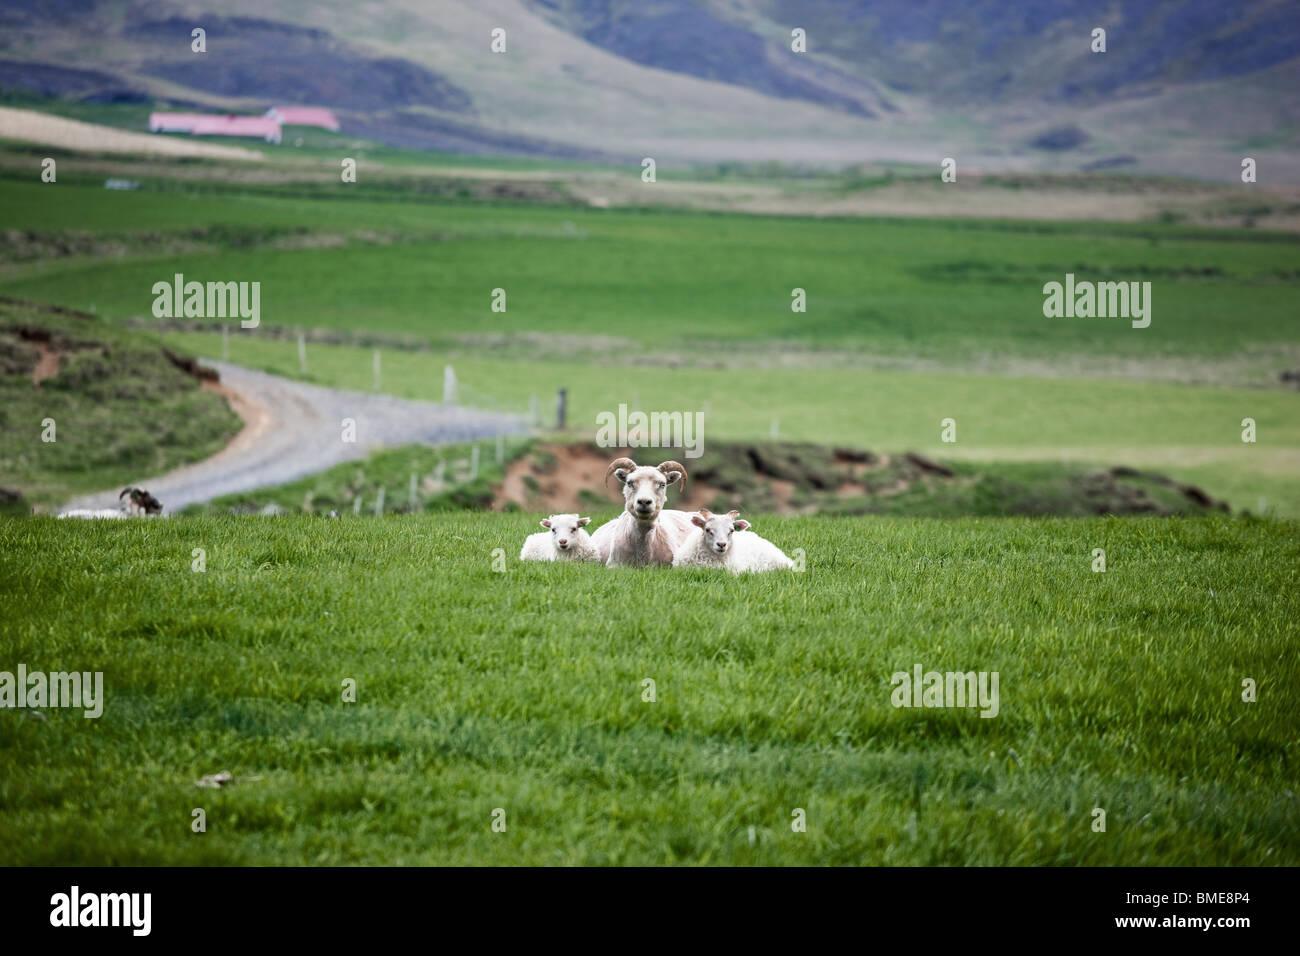 Sheep sitting on grass - Stock Image